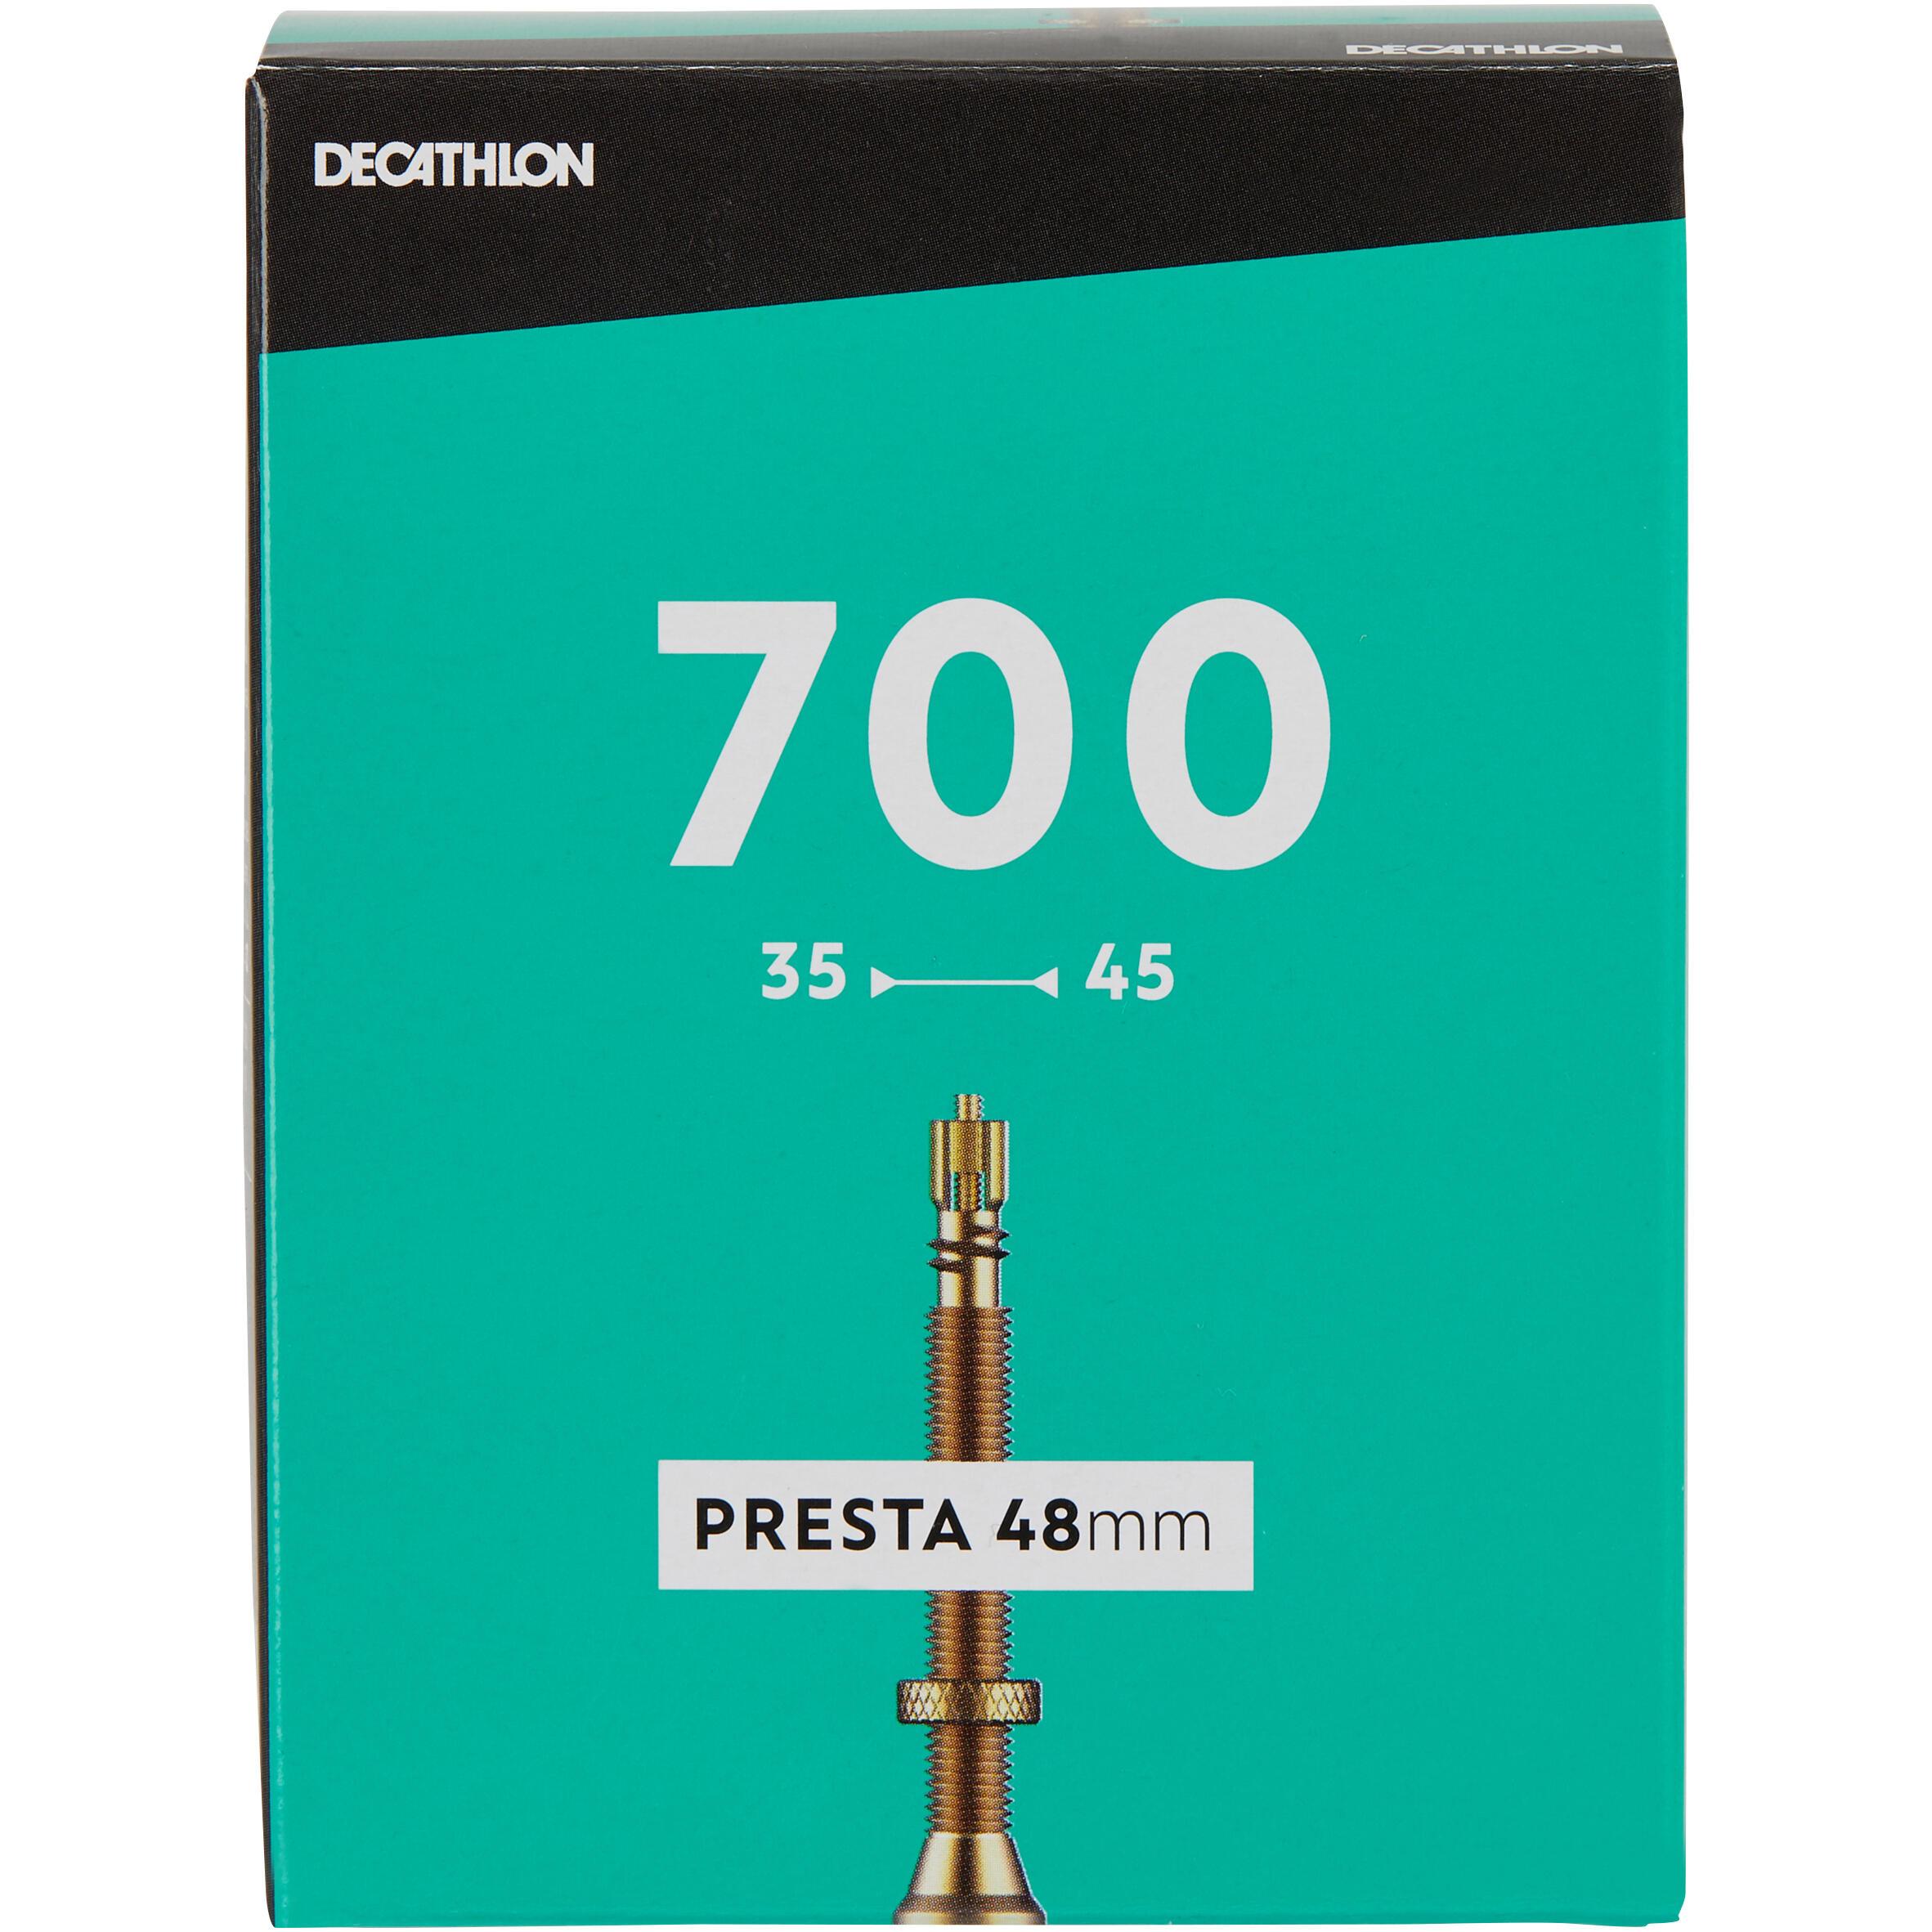 700x35/45 48 mm...